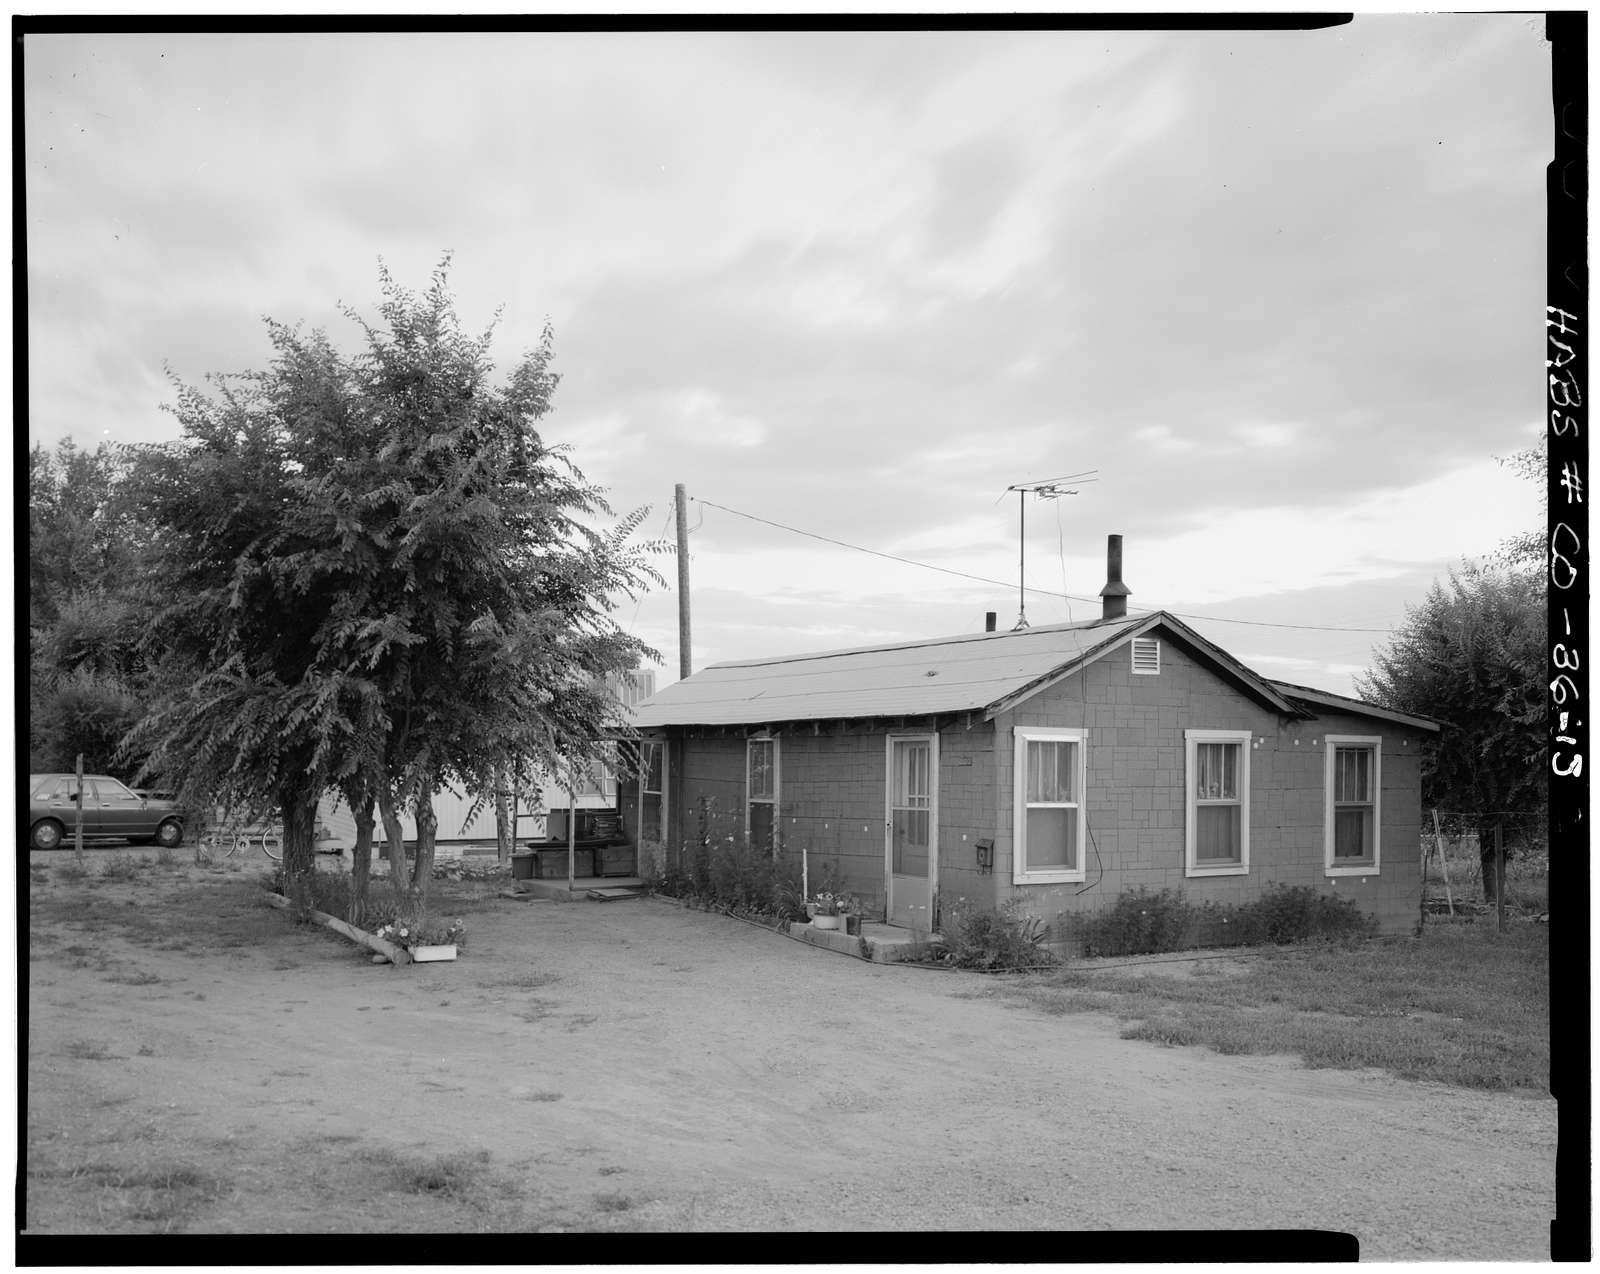 Town of McPhee, McPhee Road, Dolores, Montezuma County, CO